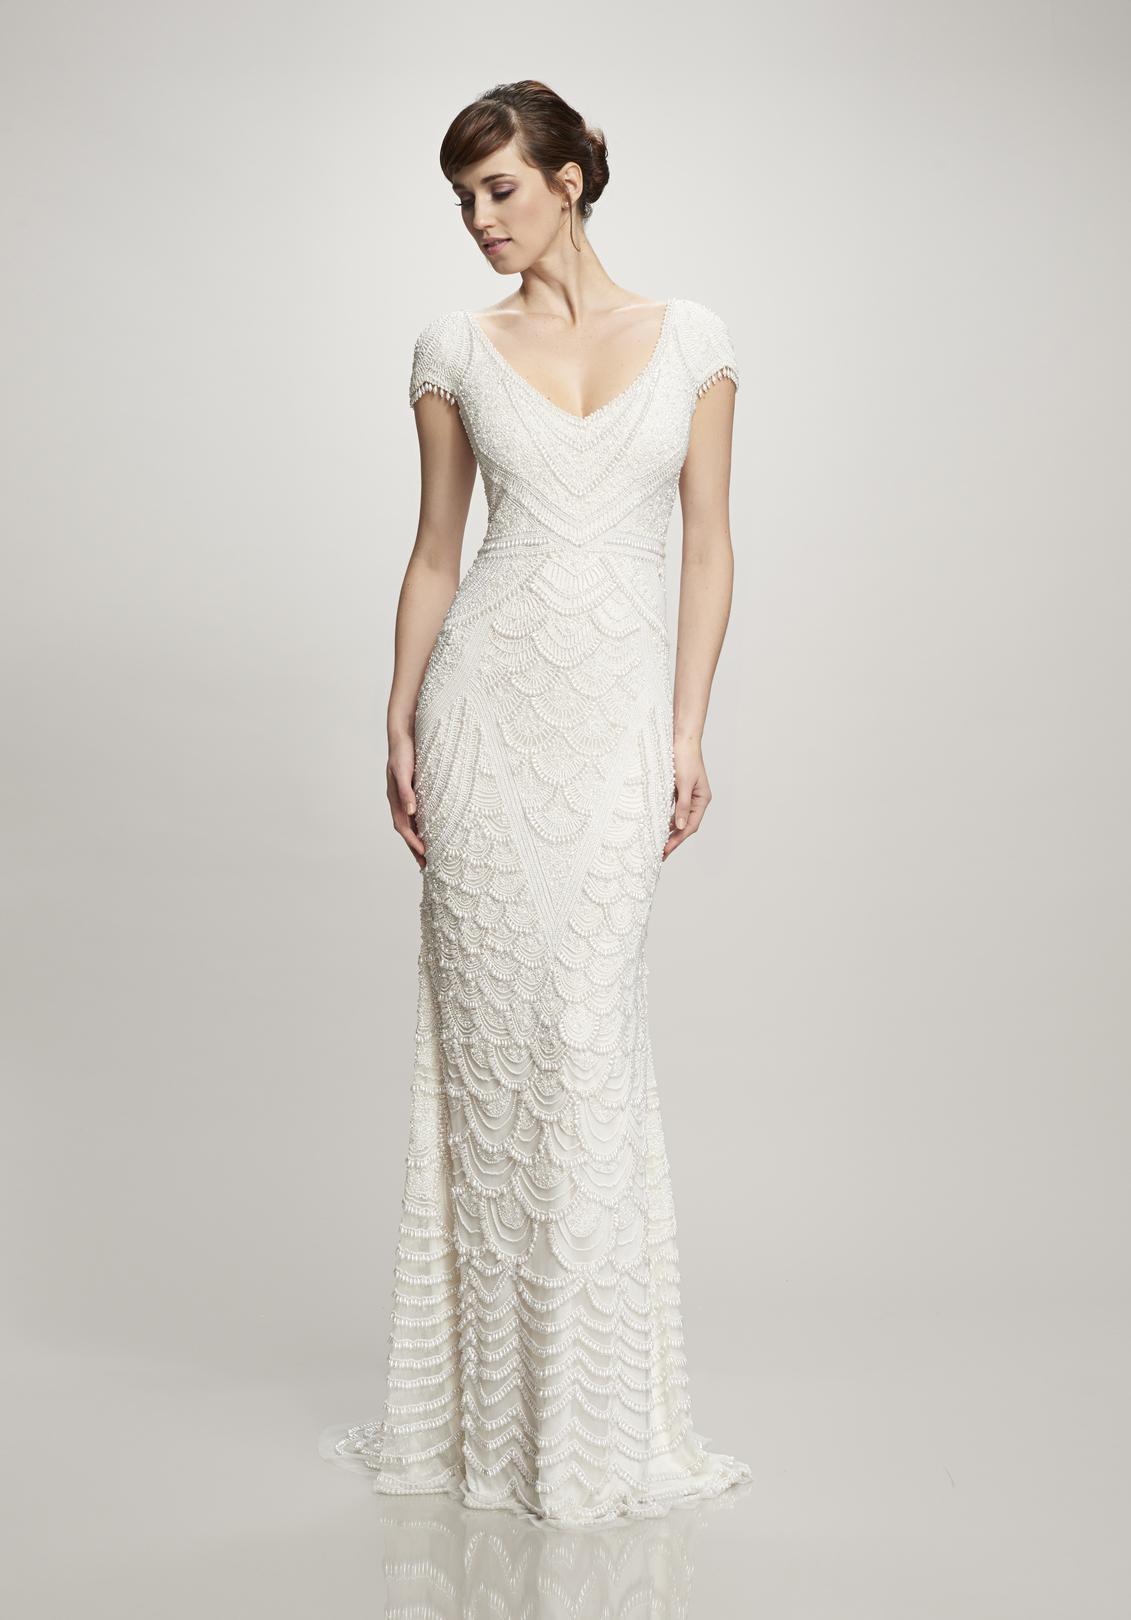 Dress main 2x 1547040146